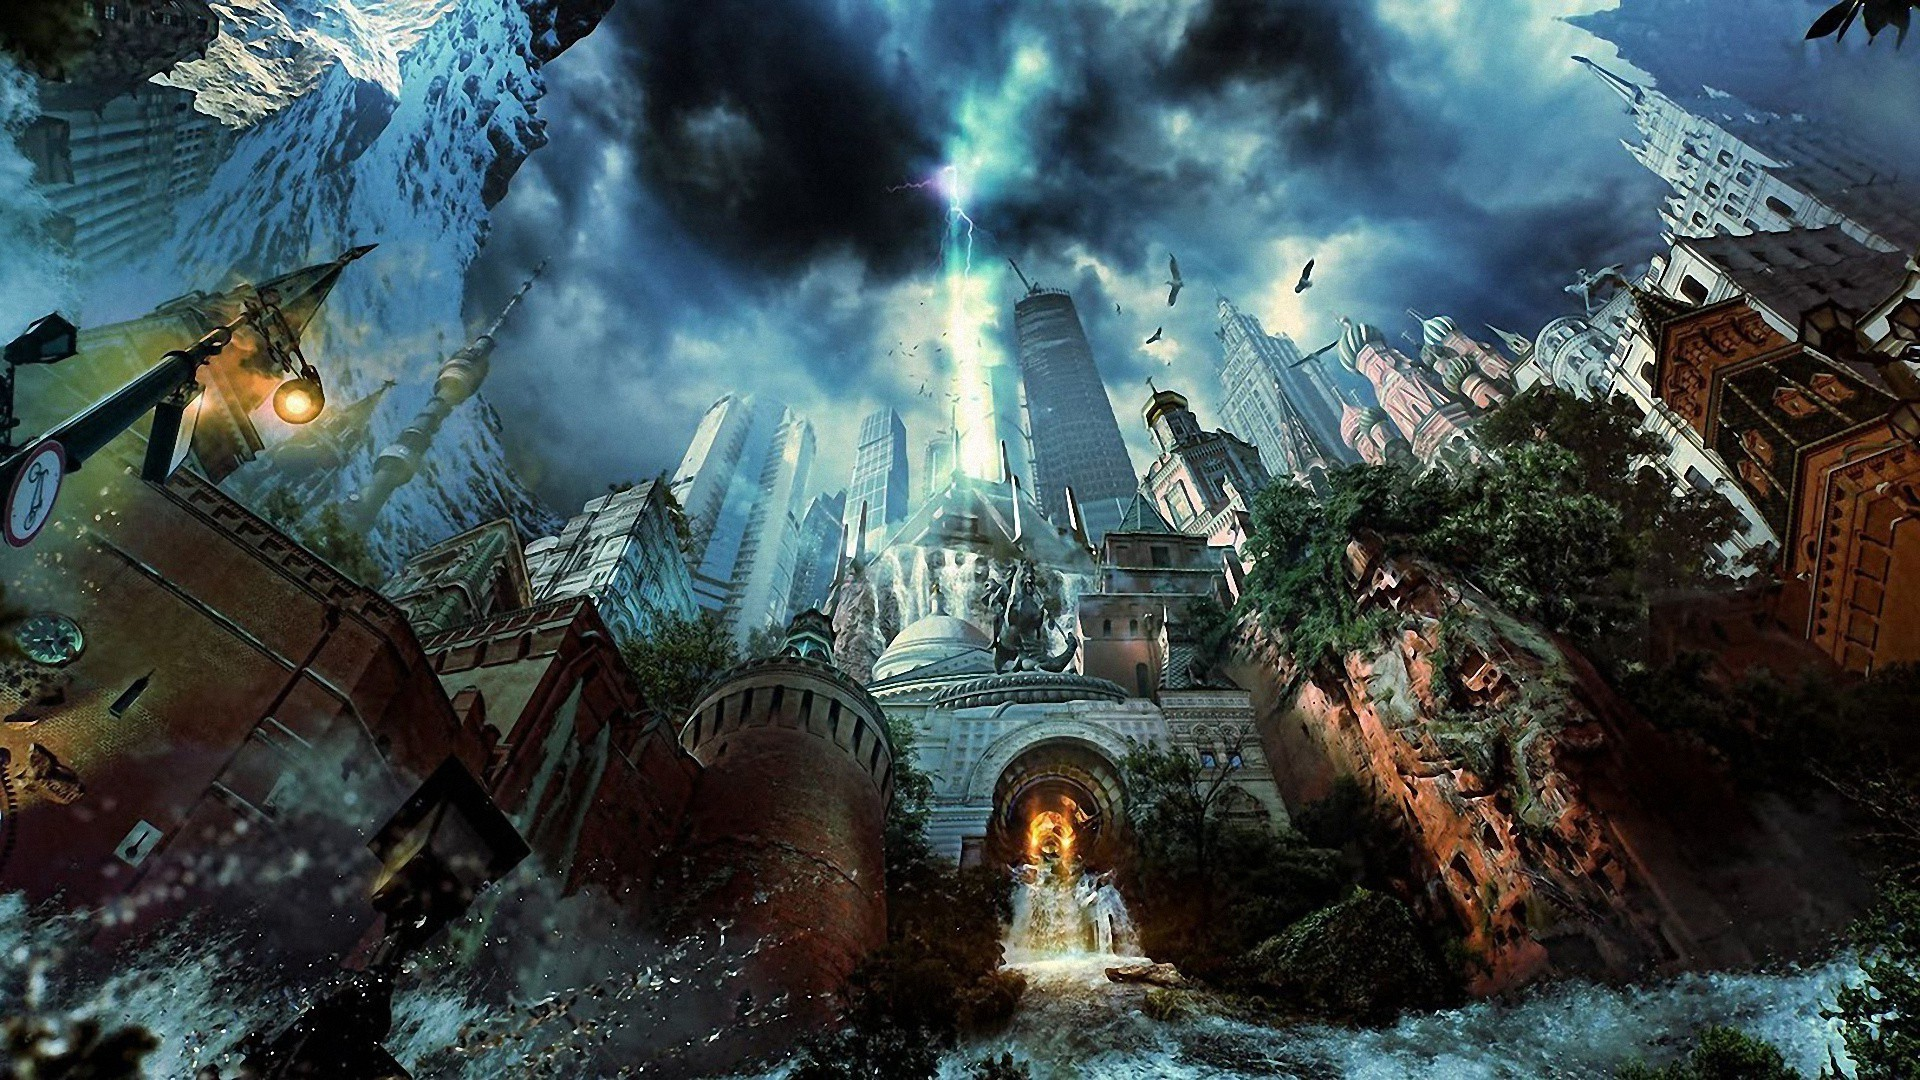 Fantasy Hebus High Definition Wallpaper | Full HD Wallpapers .